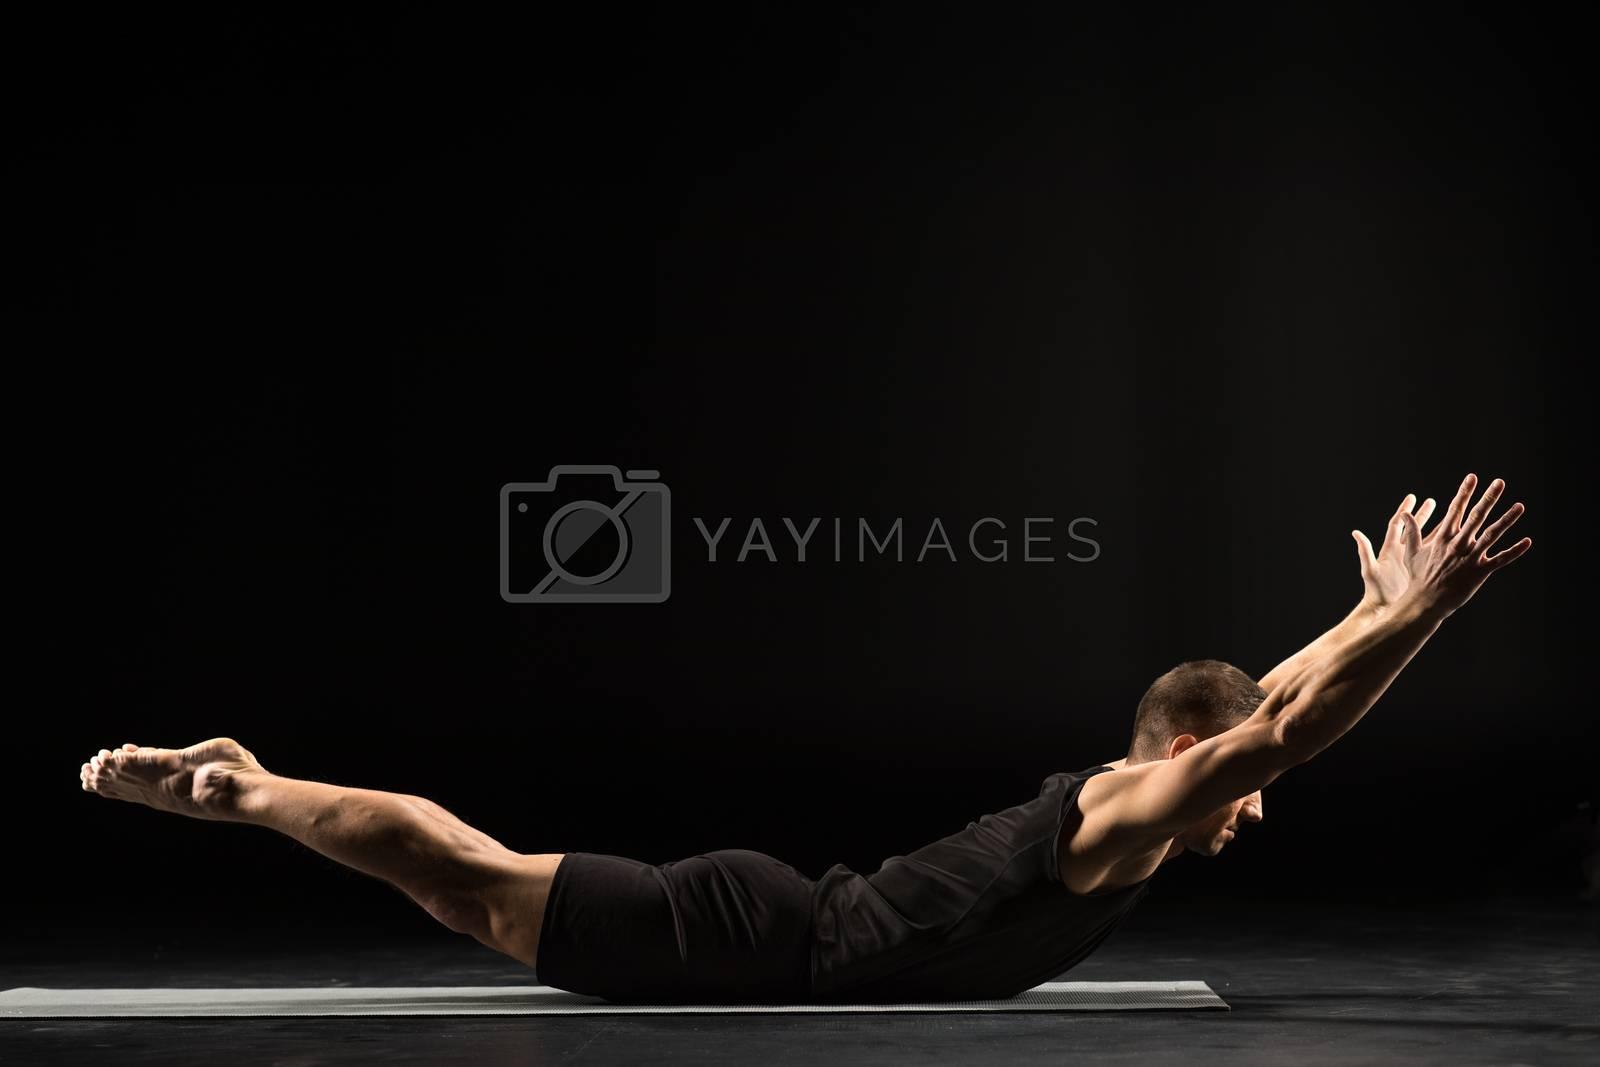 Young athletic man practicing yoga doing Naukasana The Boat Pose on yoga mat